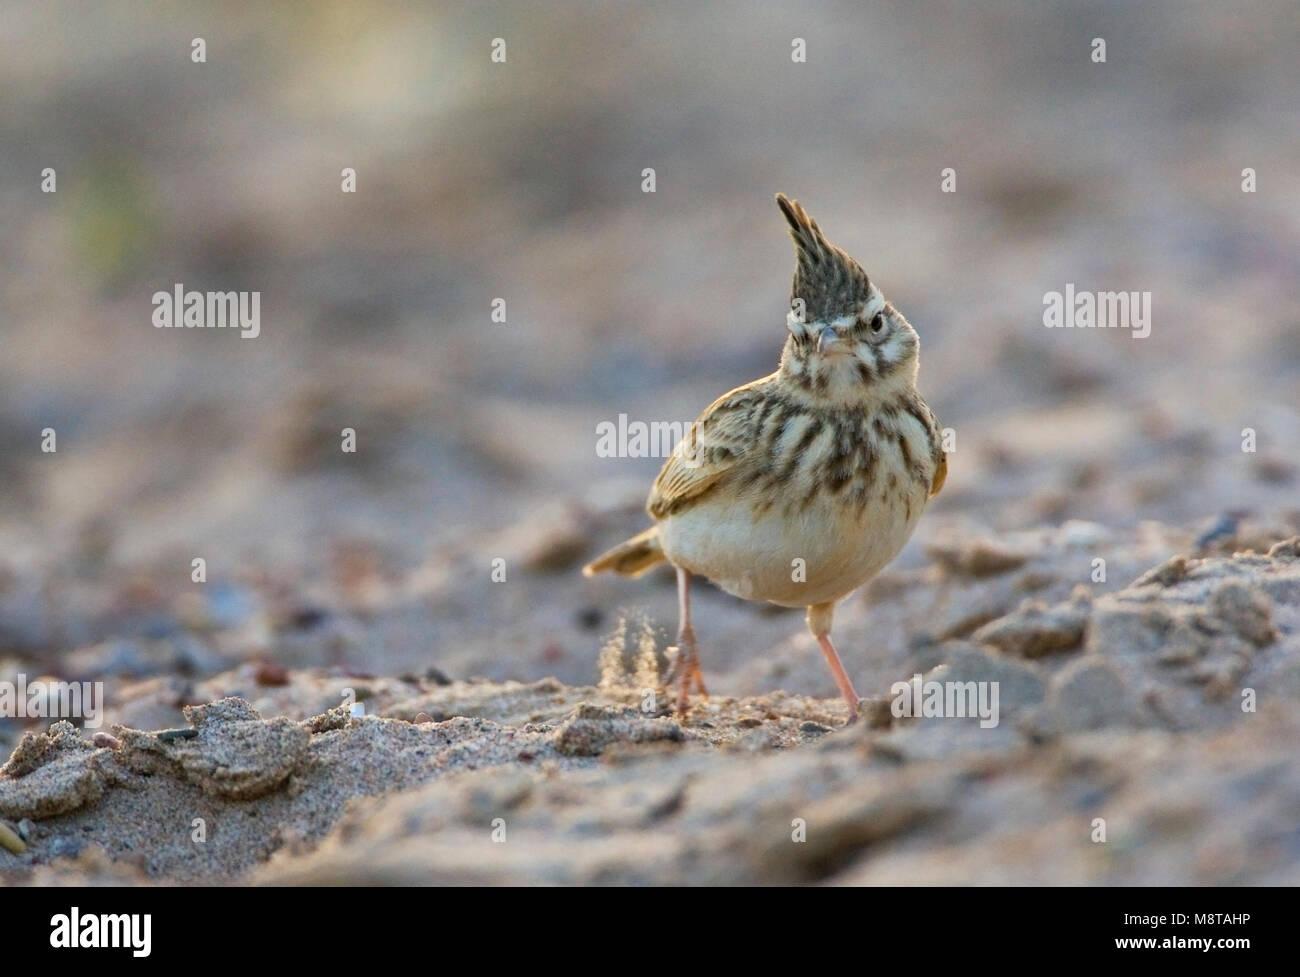 Kuifleeuwerik, Crested Lark, Galerida cristata Stock Photo